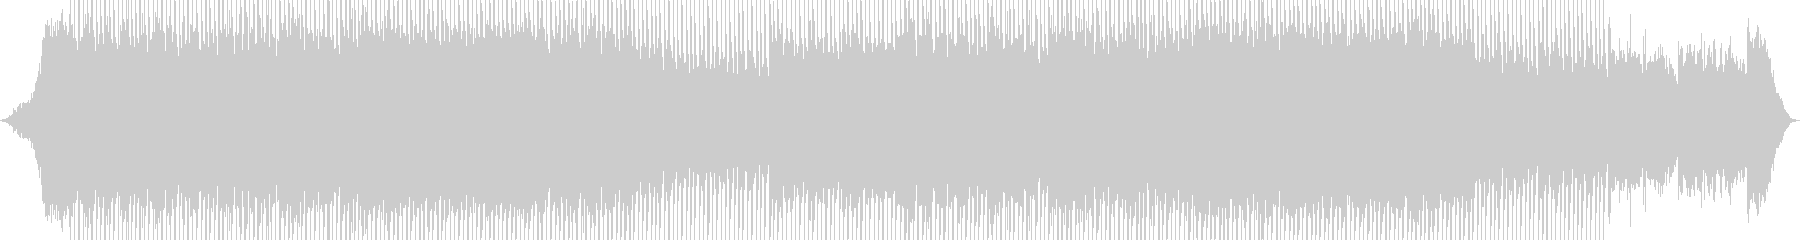 EDMポップで明るいクラブ系-46の未再生の波形